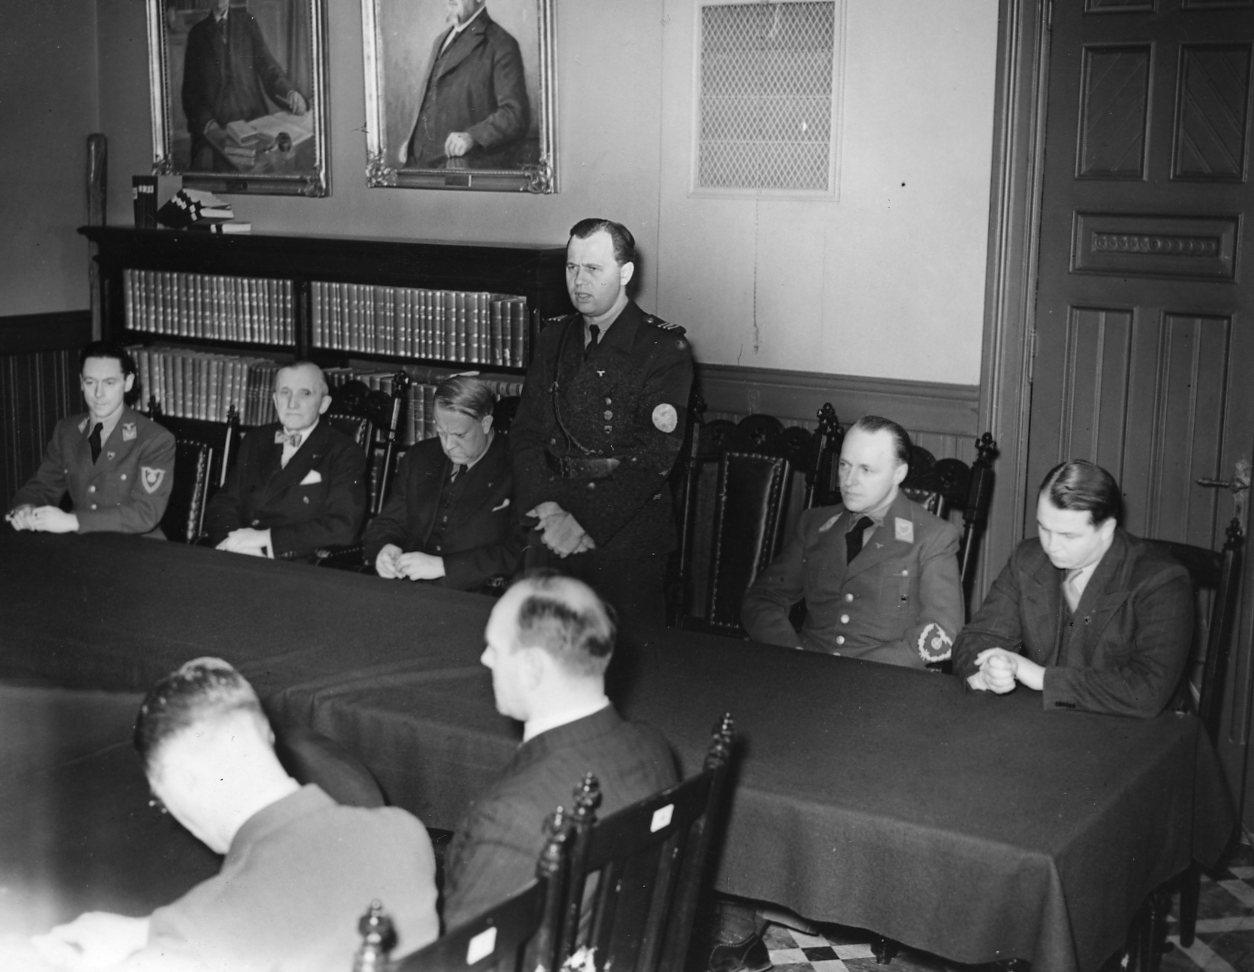 Vidkun Quisling in Drontheim. 1941/11/14-15.